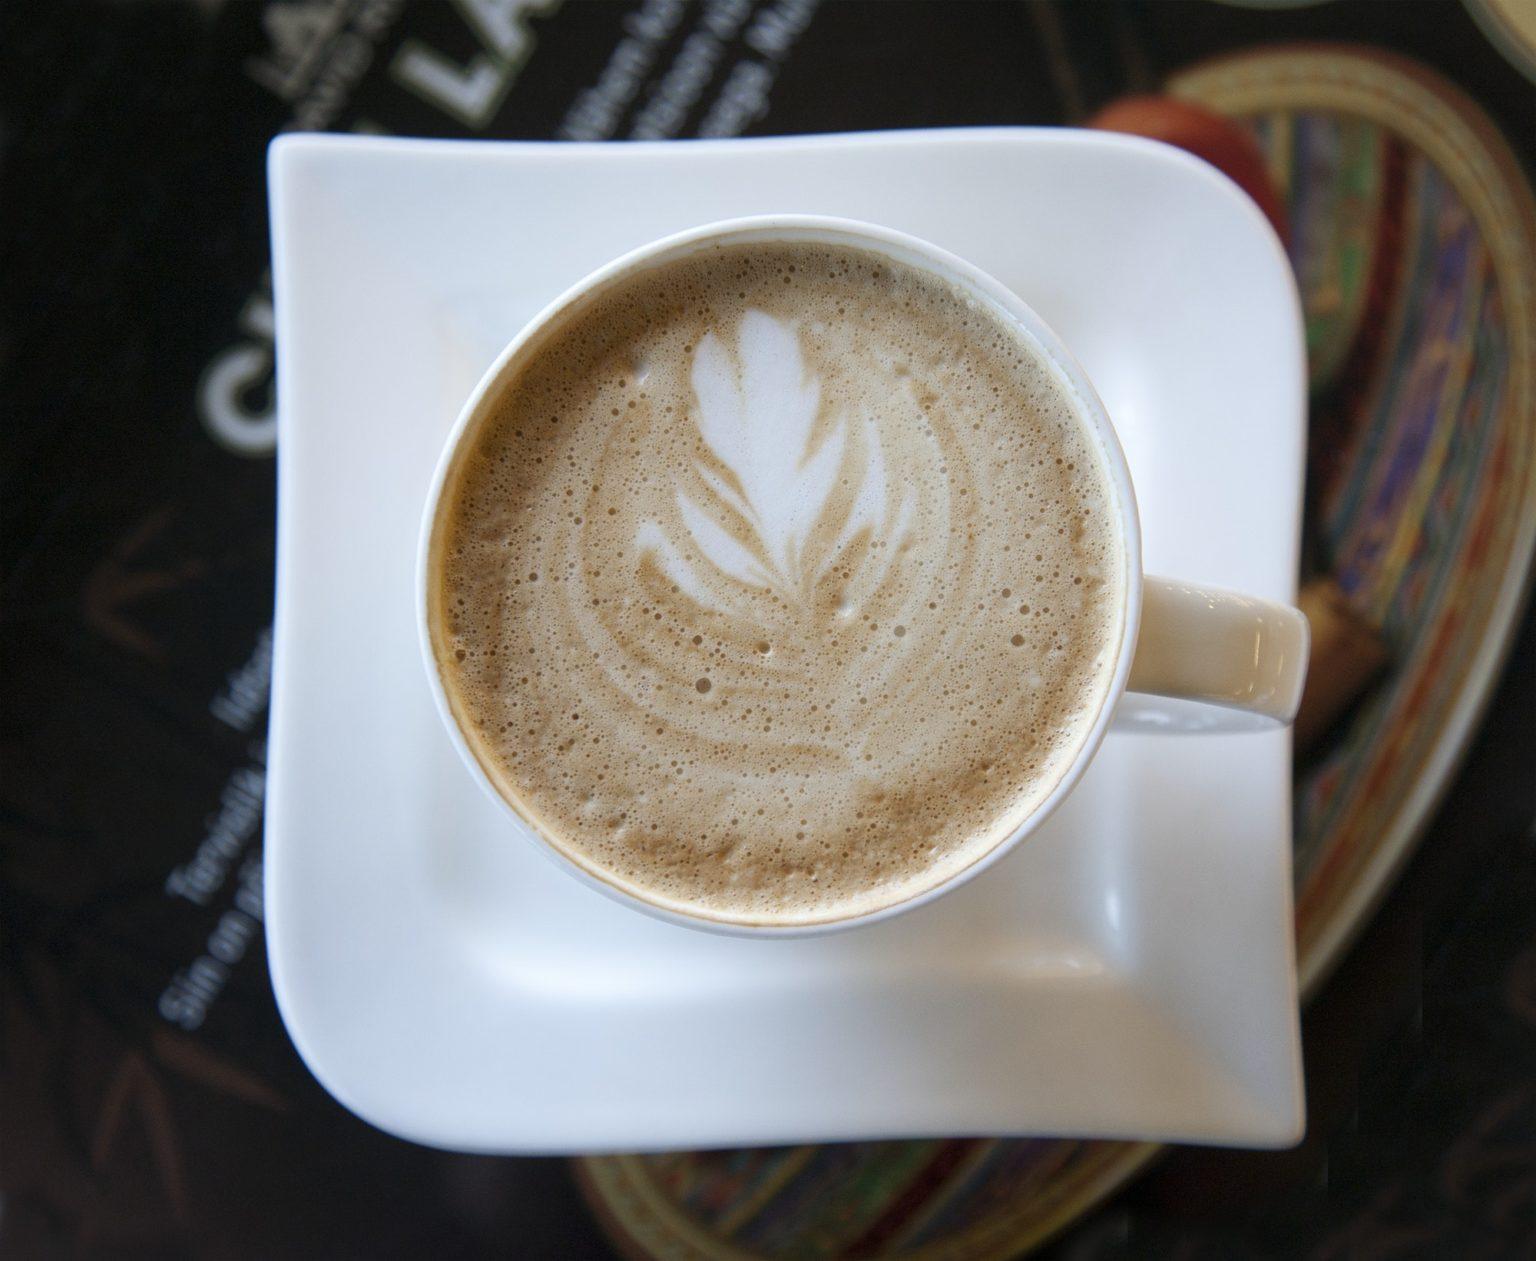 Latte With a Leaf Design